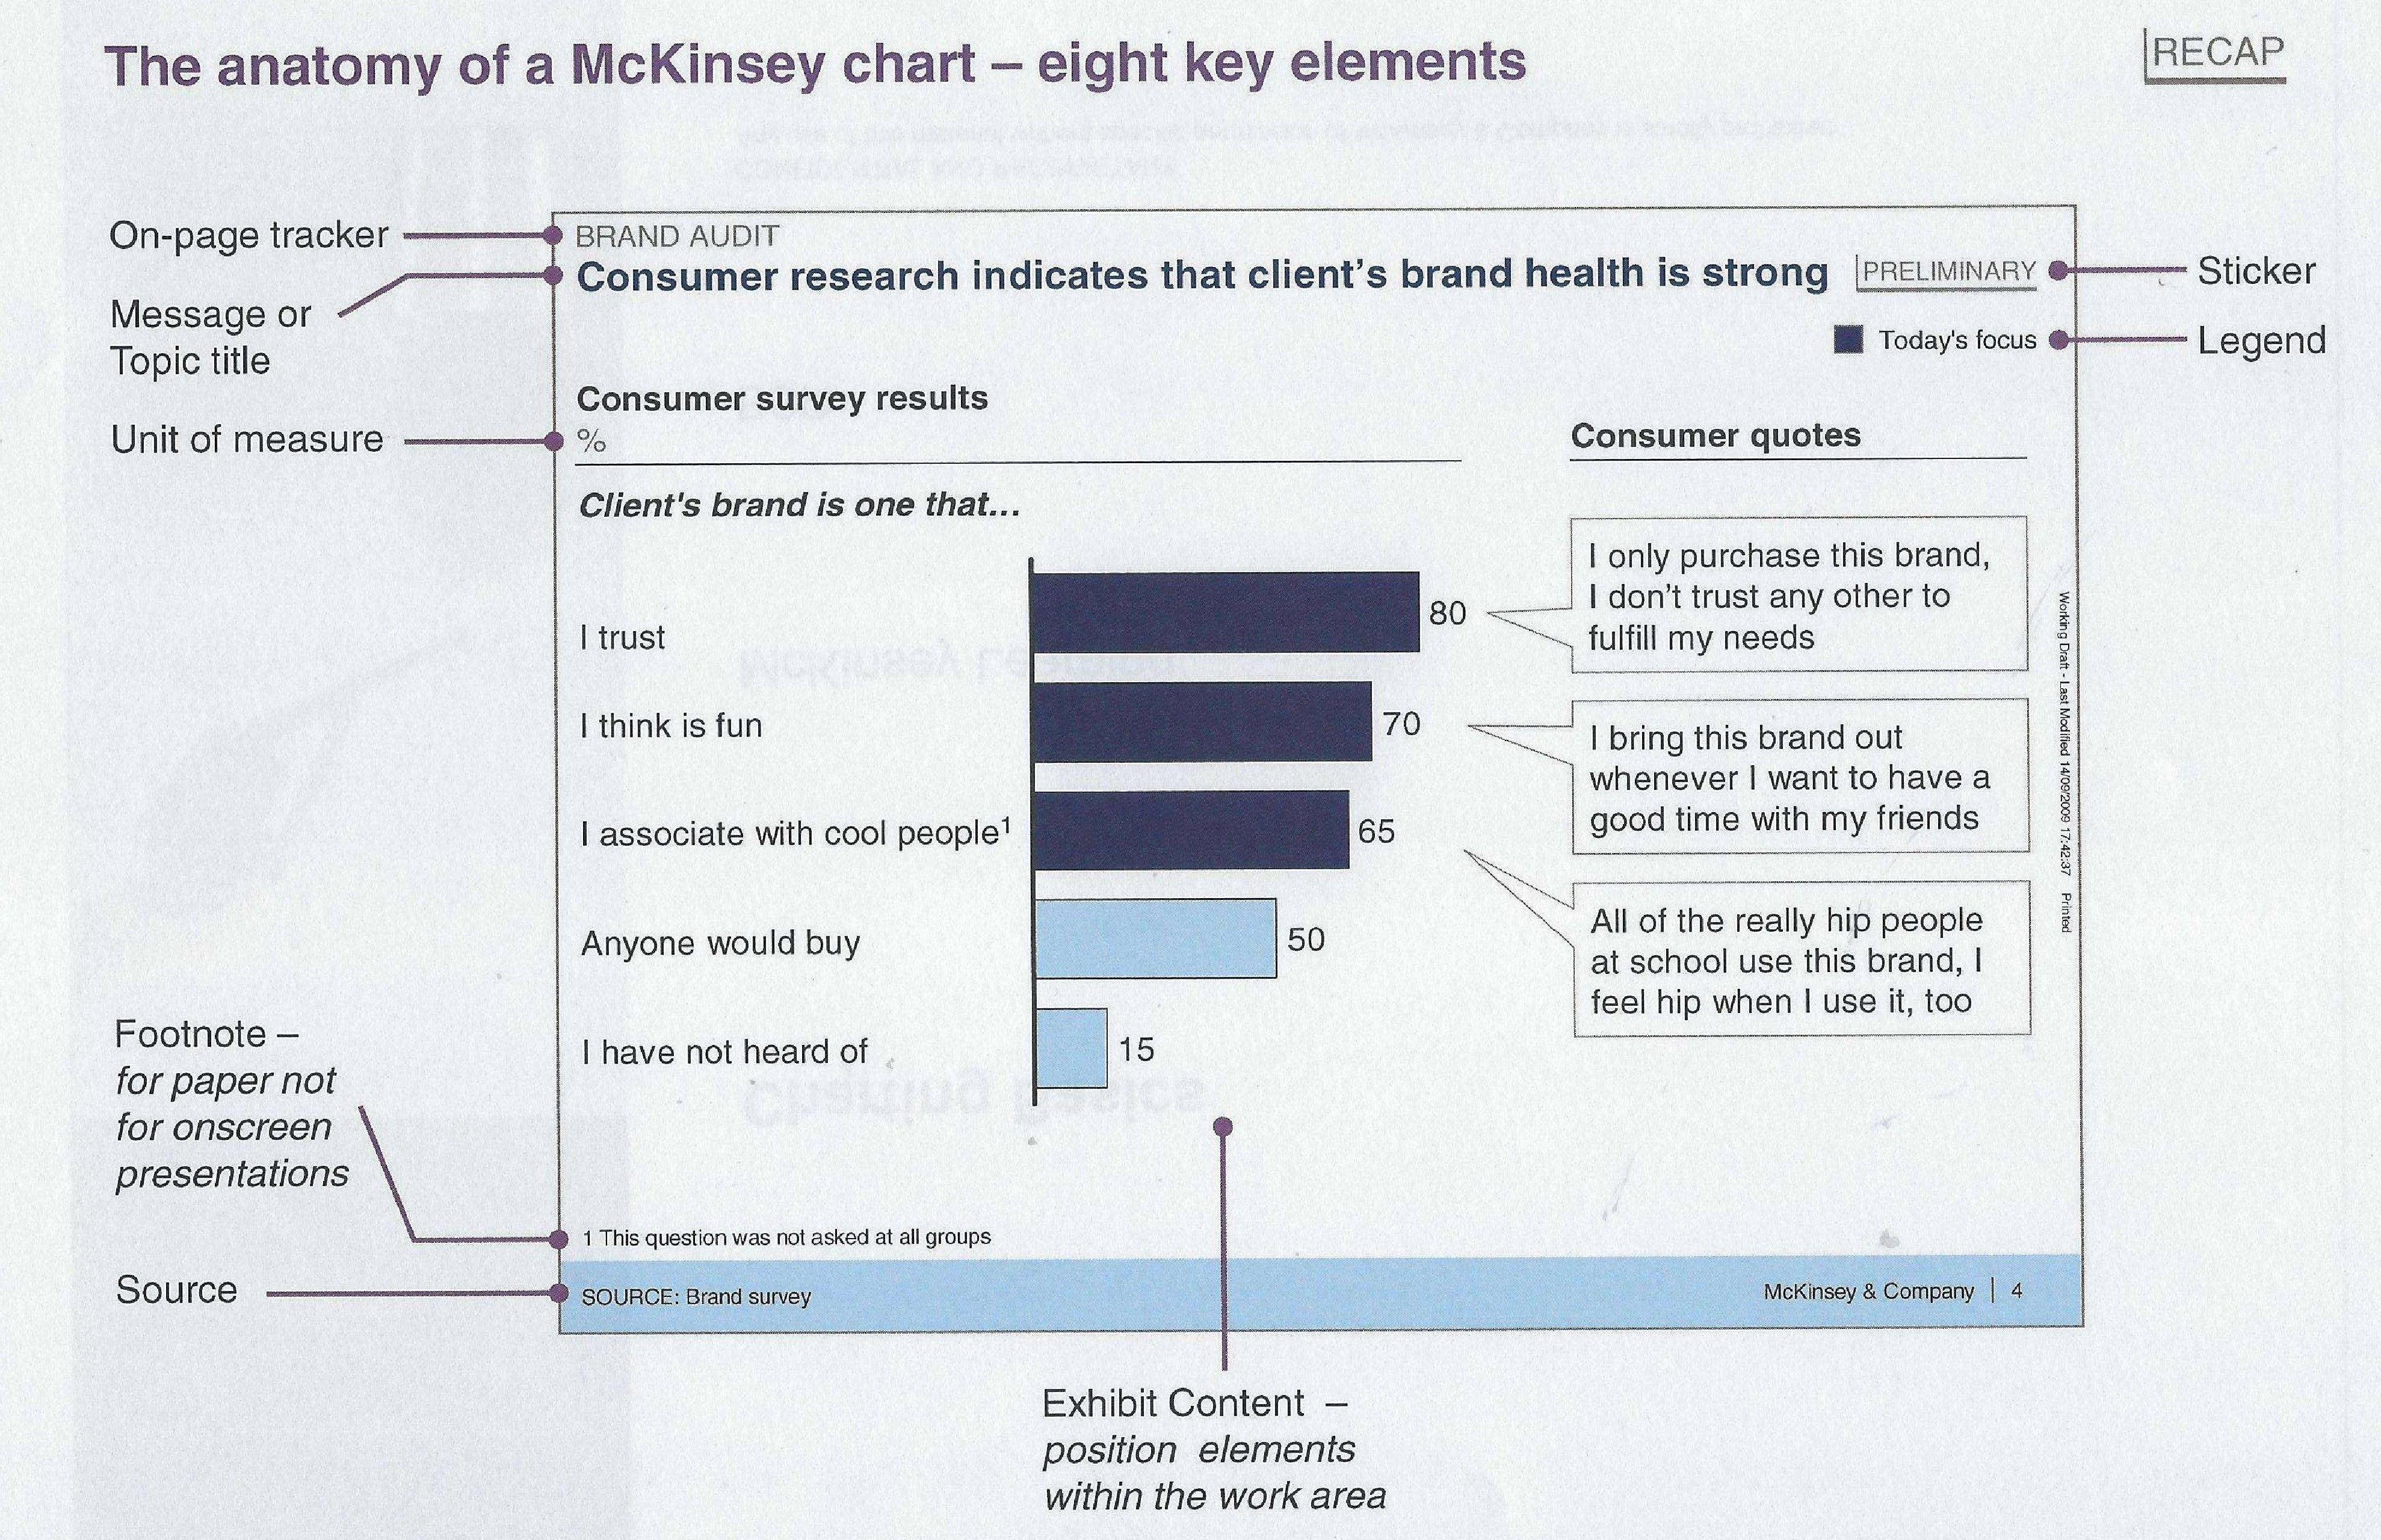 Anatomy of a McKinsey chart | Work | Consumer survey, Chart